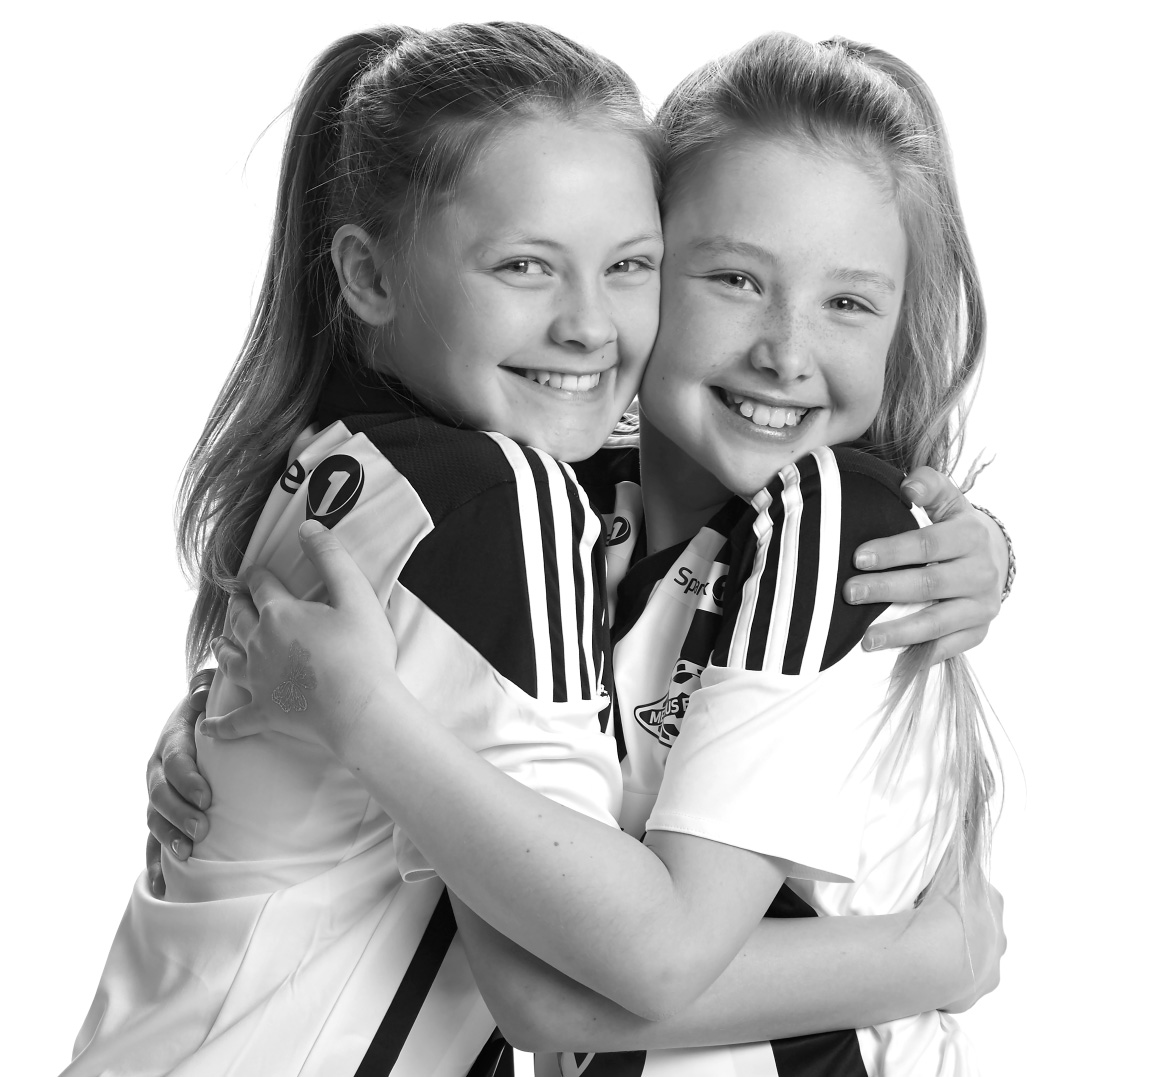 cupmesterskap norge kvinner fotball